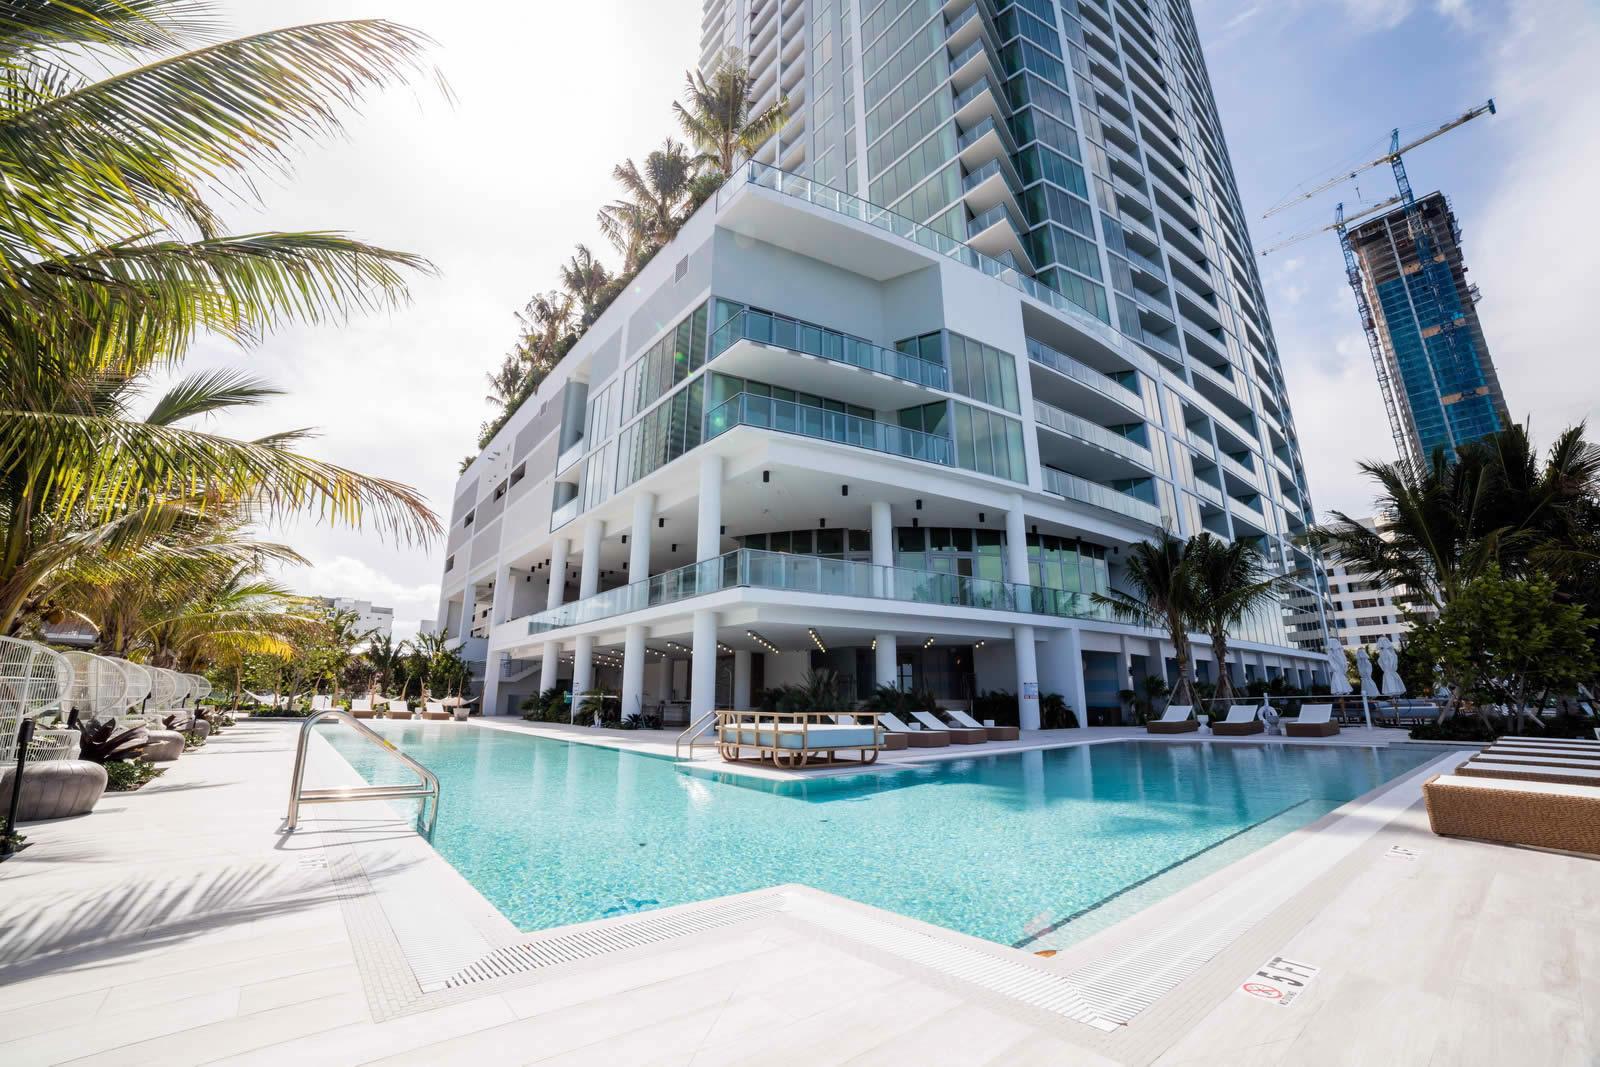 appartement-a-vendre-edgewater-immeuble-haut-standing-ascenseur-2-piscines